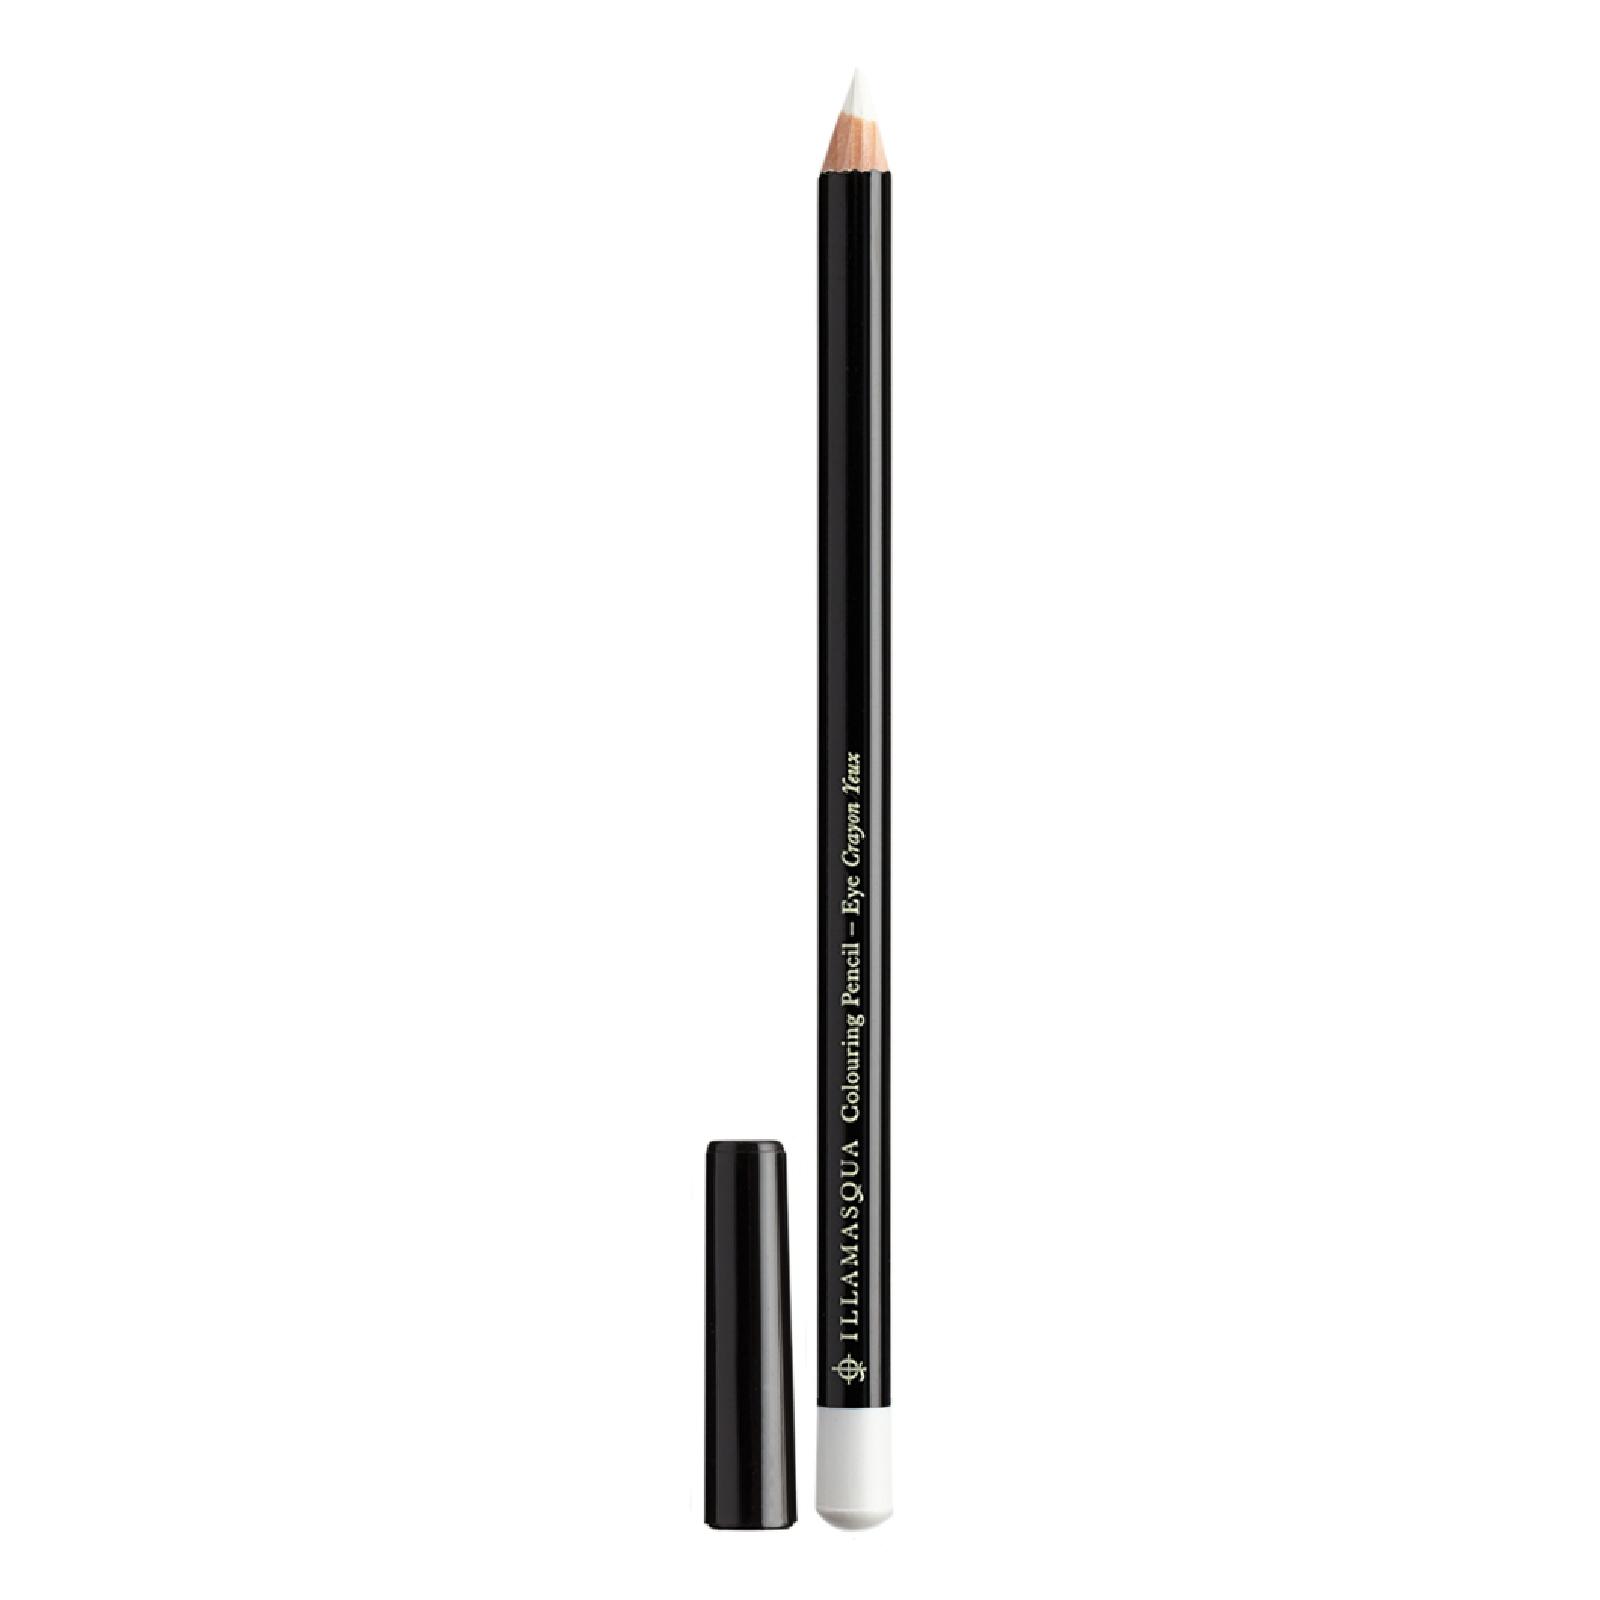 Illamasqua Colouring Eye Pencil 1.4g (Various Shades) - Elate